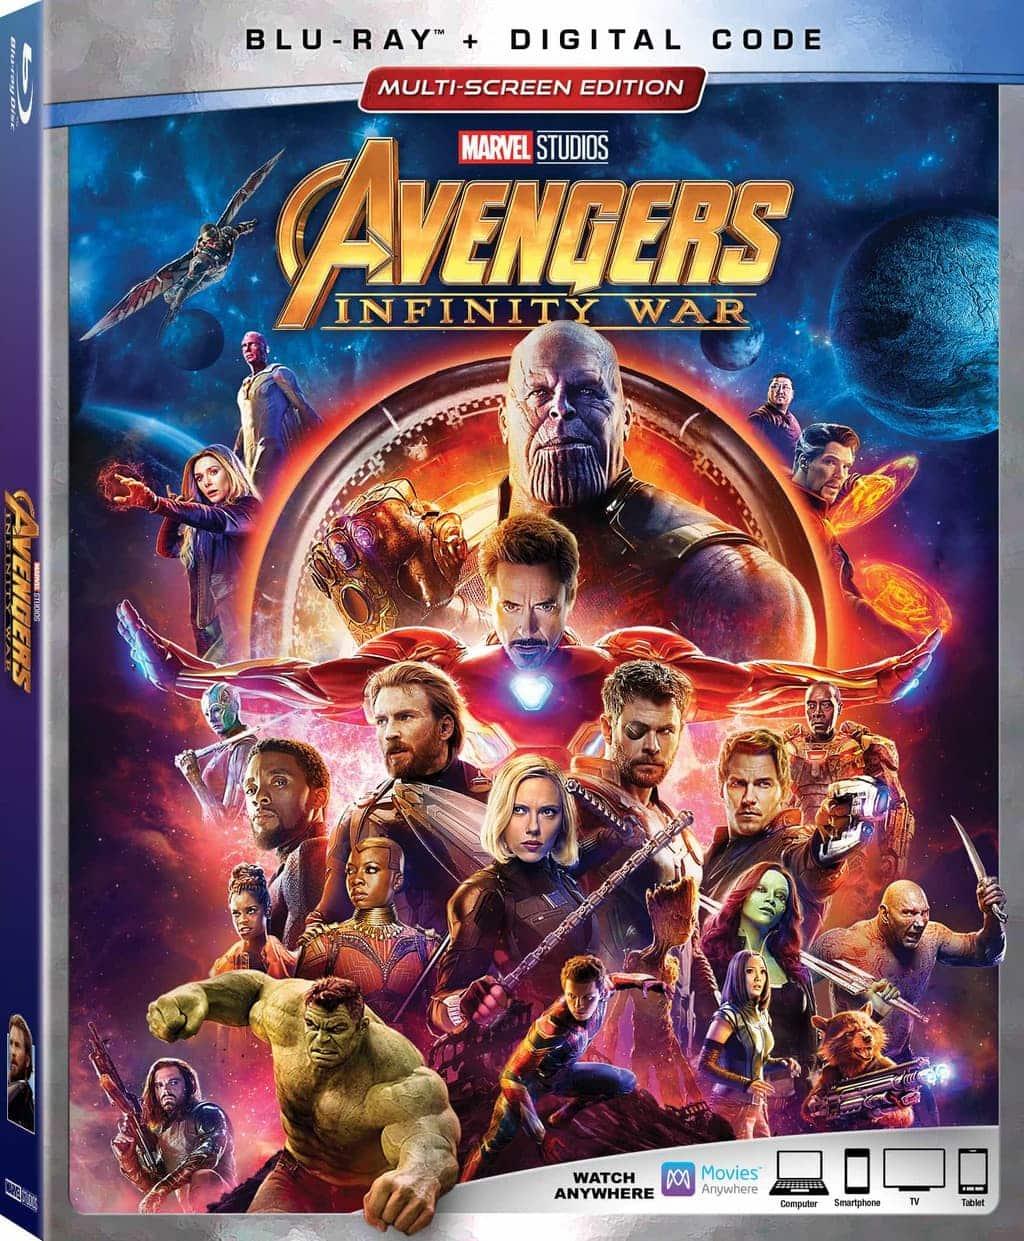 Avengers Infinity War BluRay and DVD